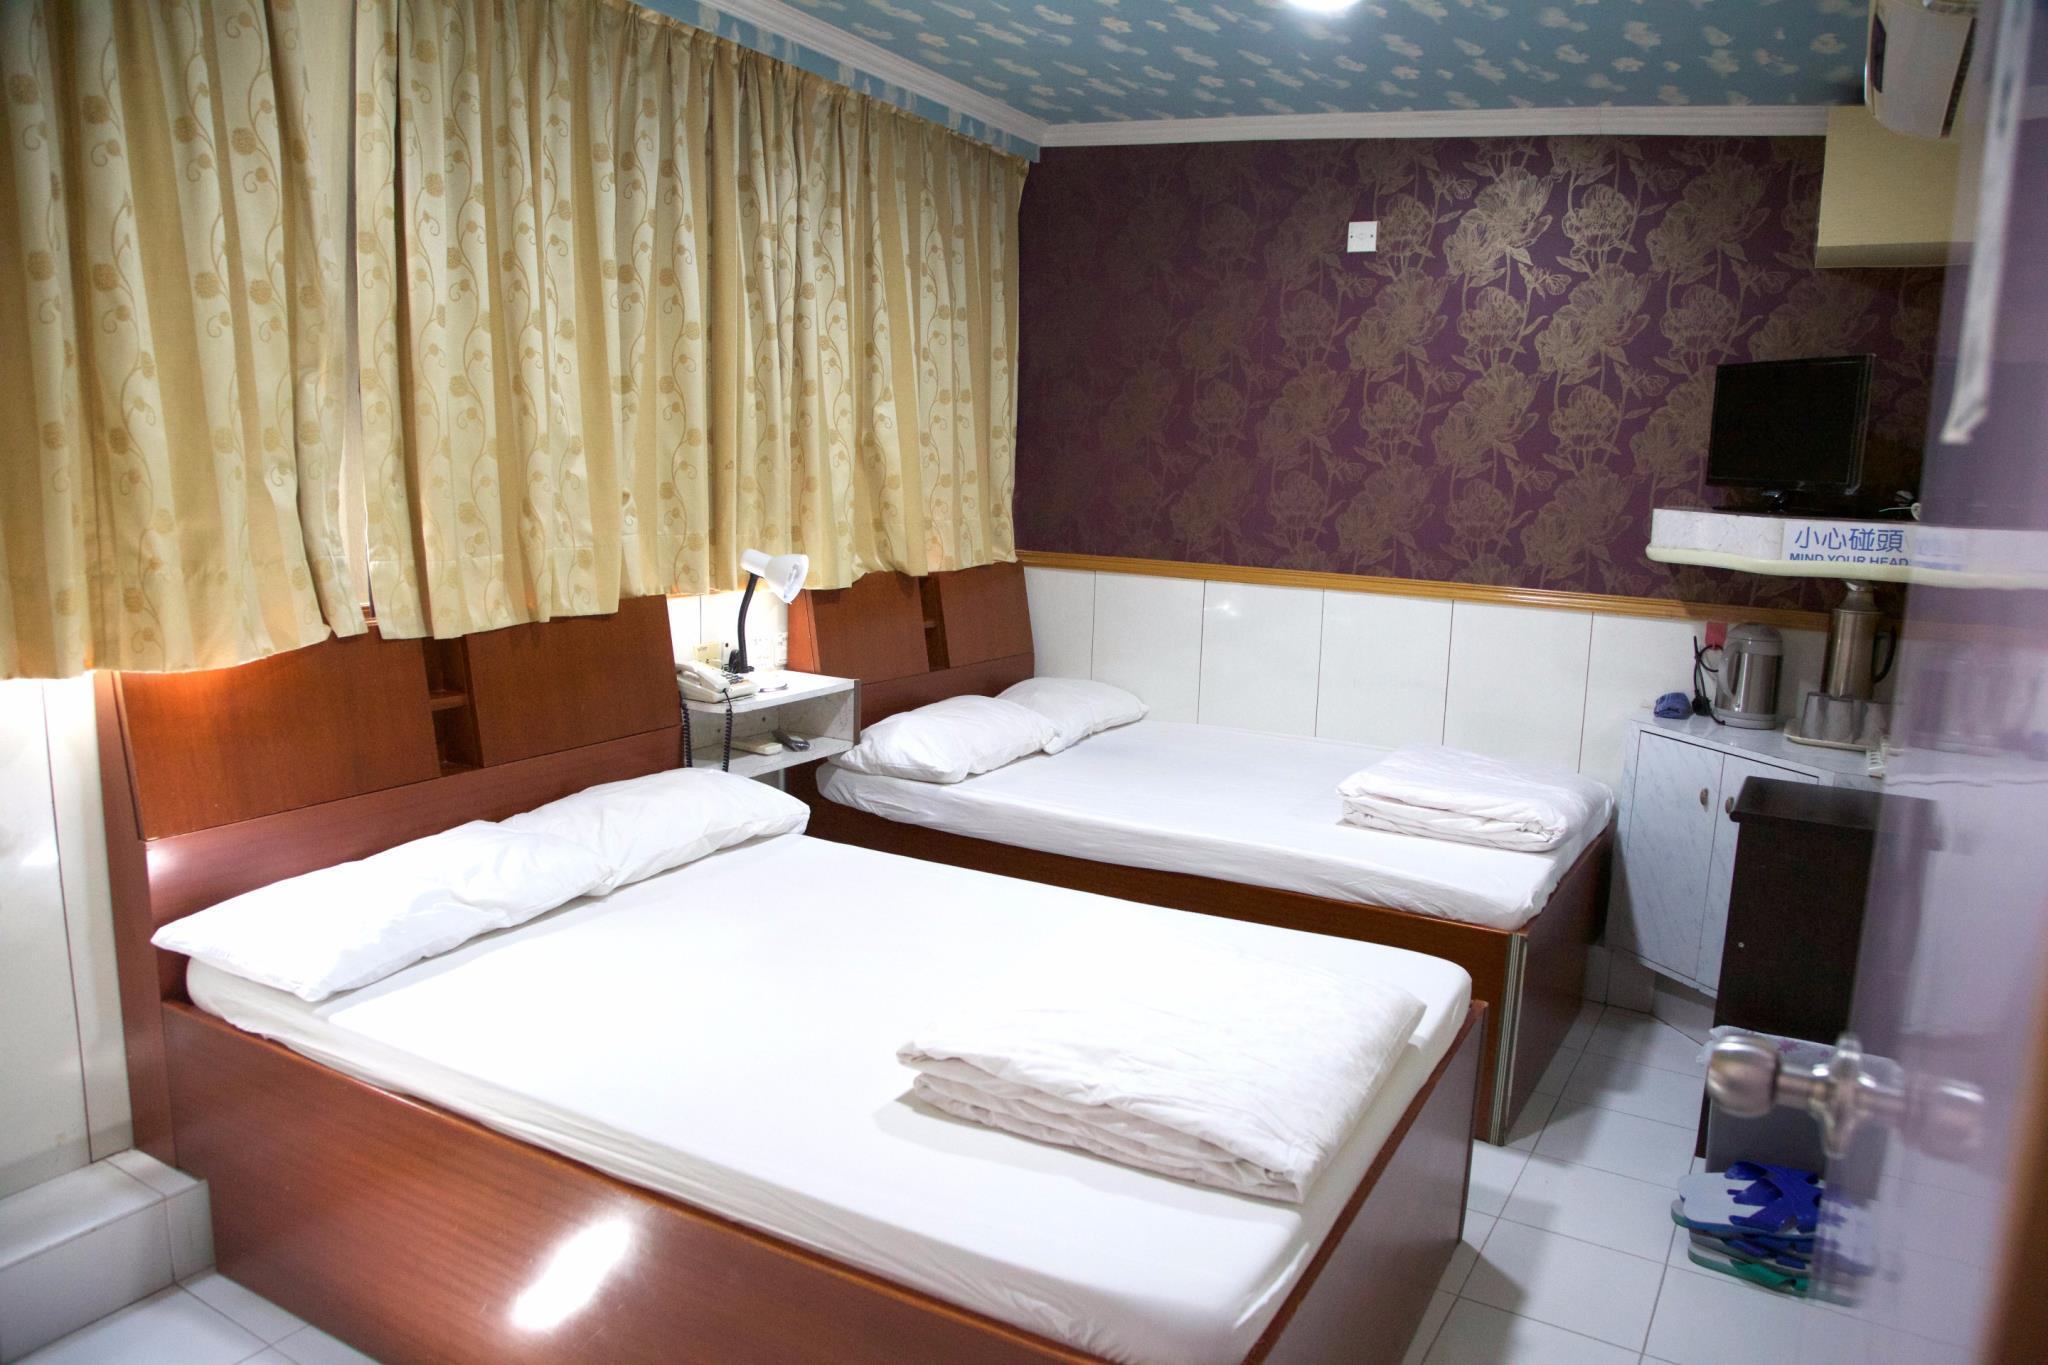 Yau King Hotel